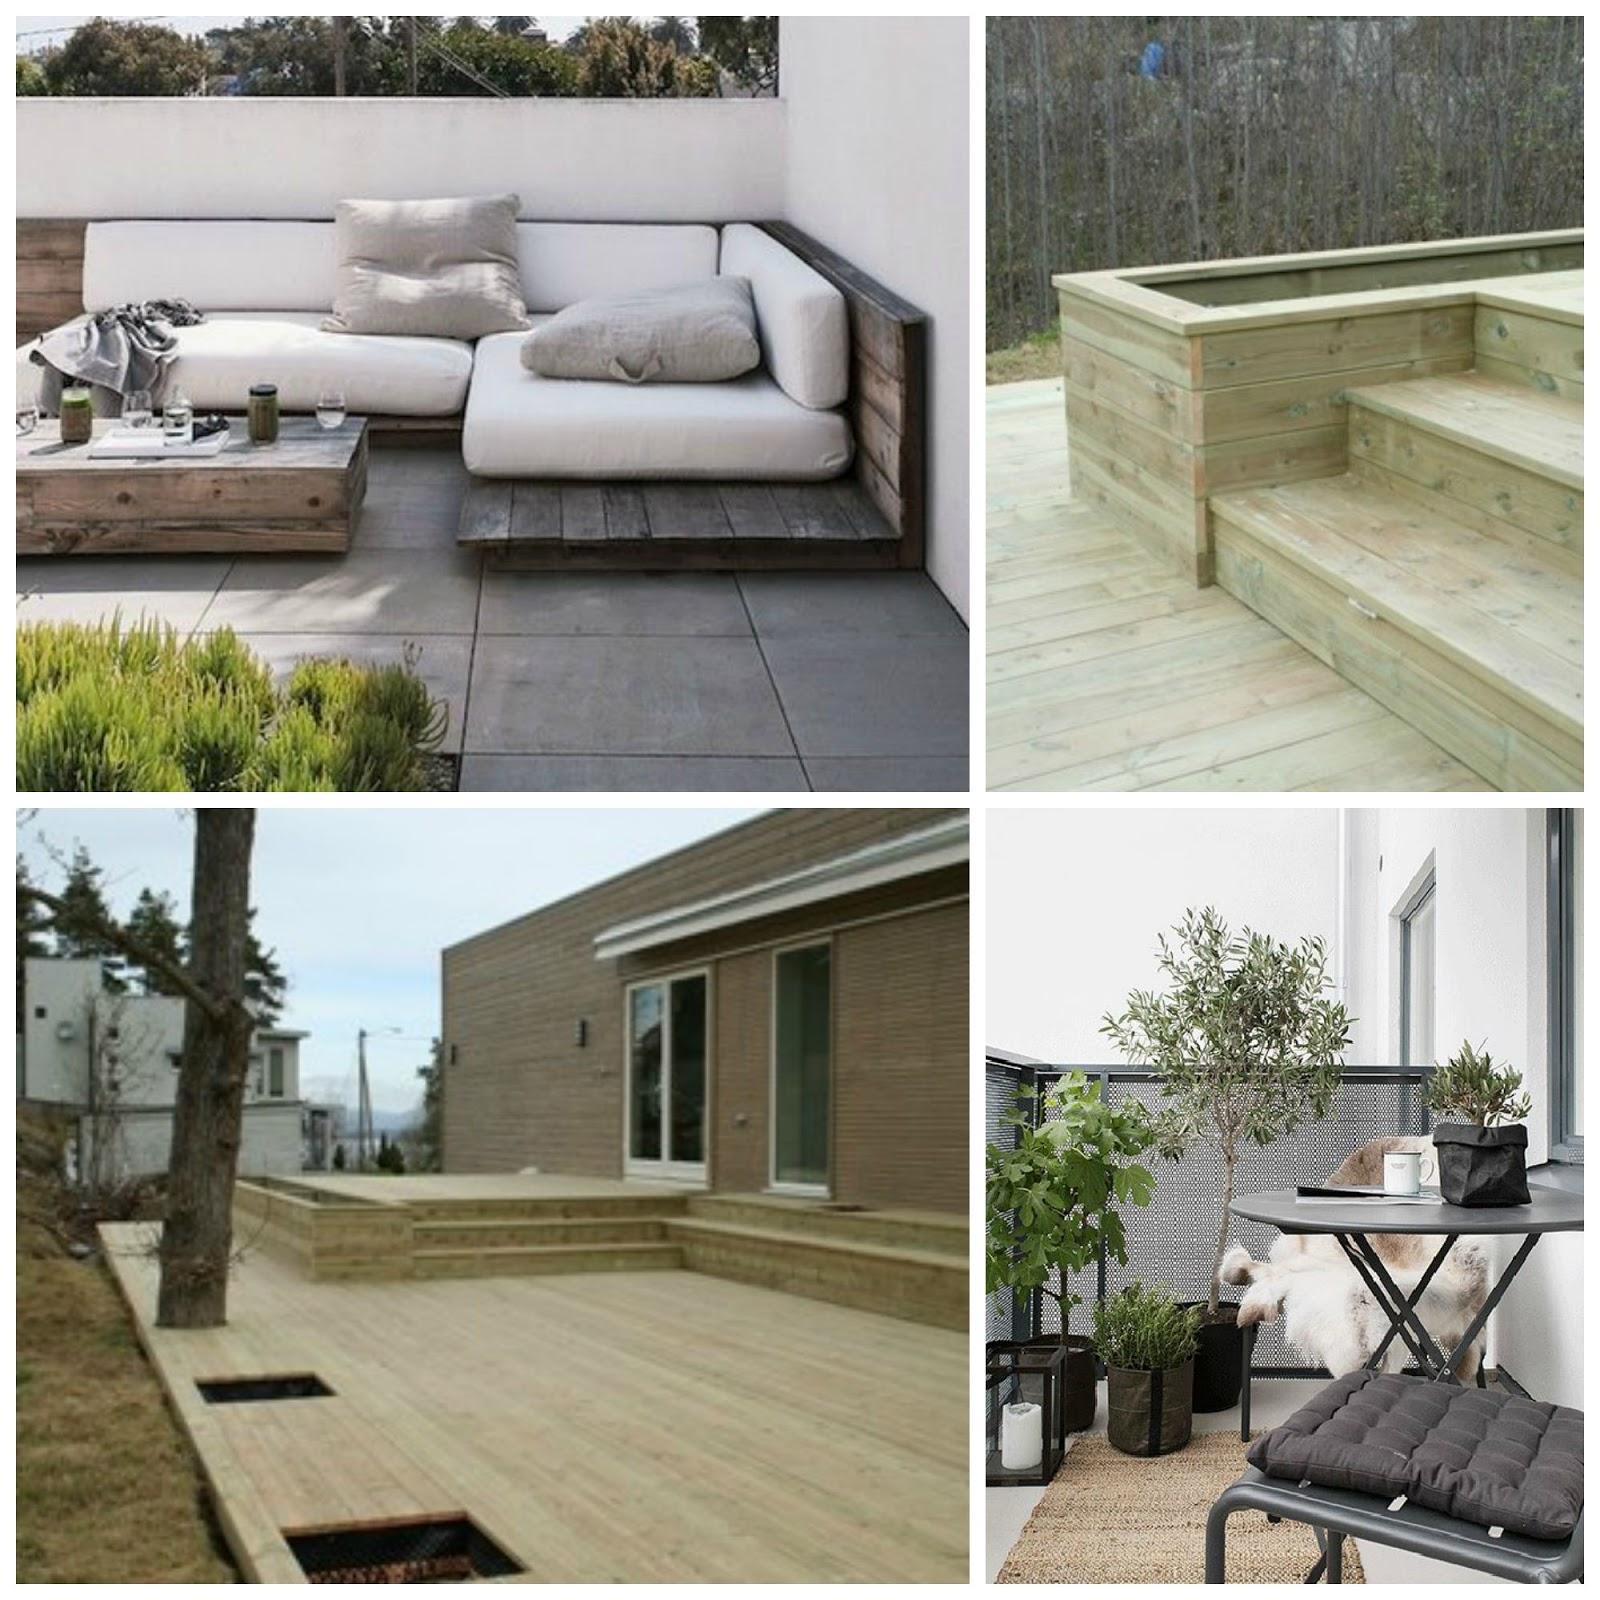 møbler til terrassen